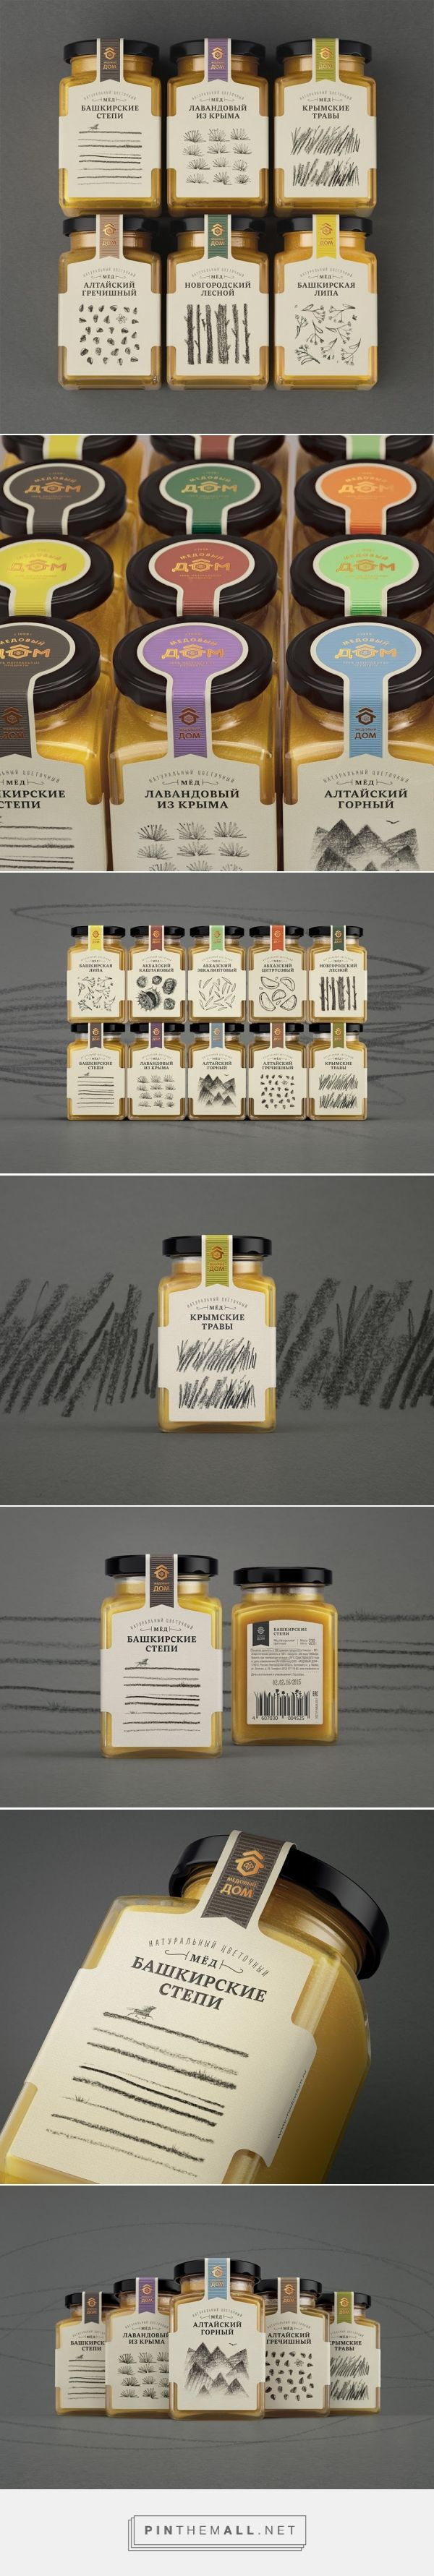 Honey House packaging designed by Masha Ponomareva (Russia) - http://www.packagingoftheworld.com/2016/03/honey-house.html